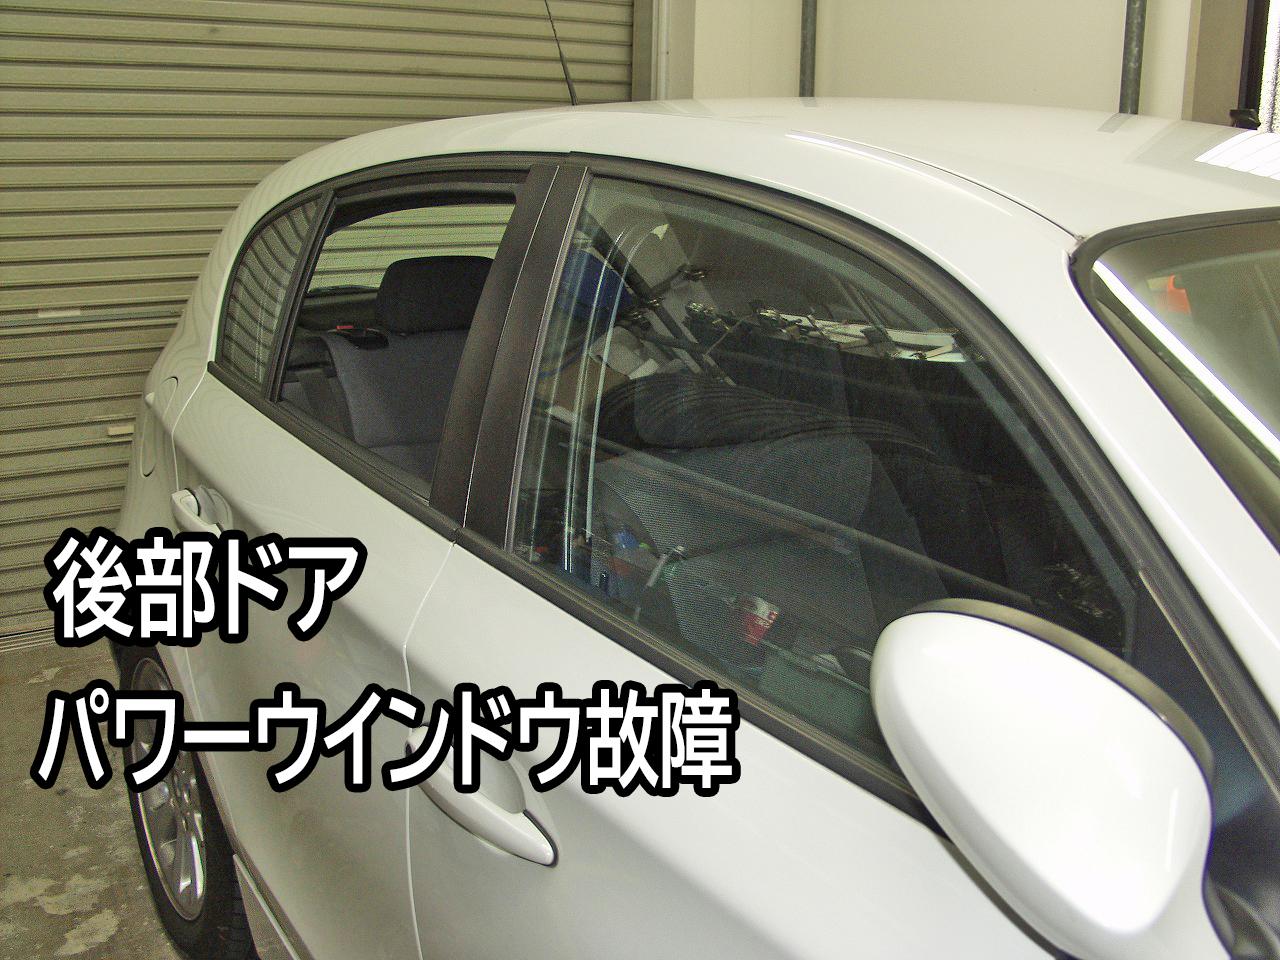 BMW E87 116iの後部ドアのパワーウインドウが故障しました。